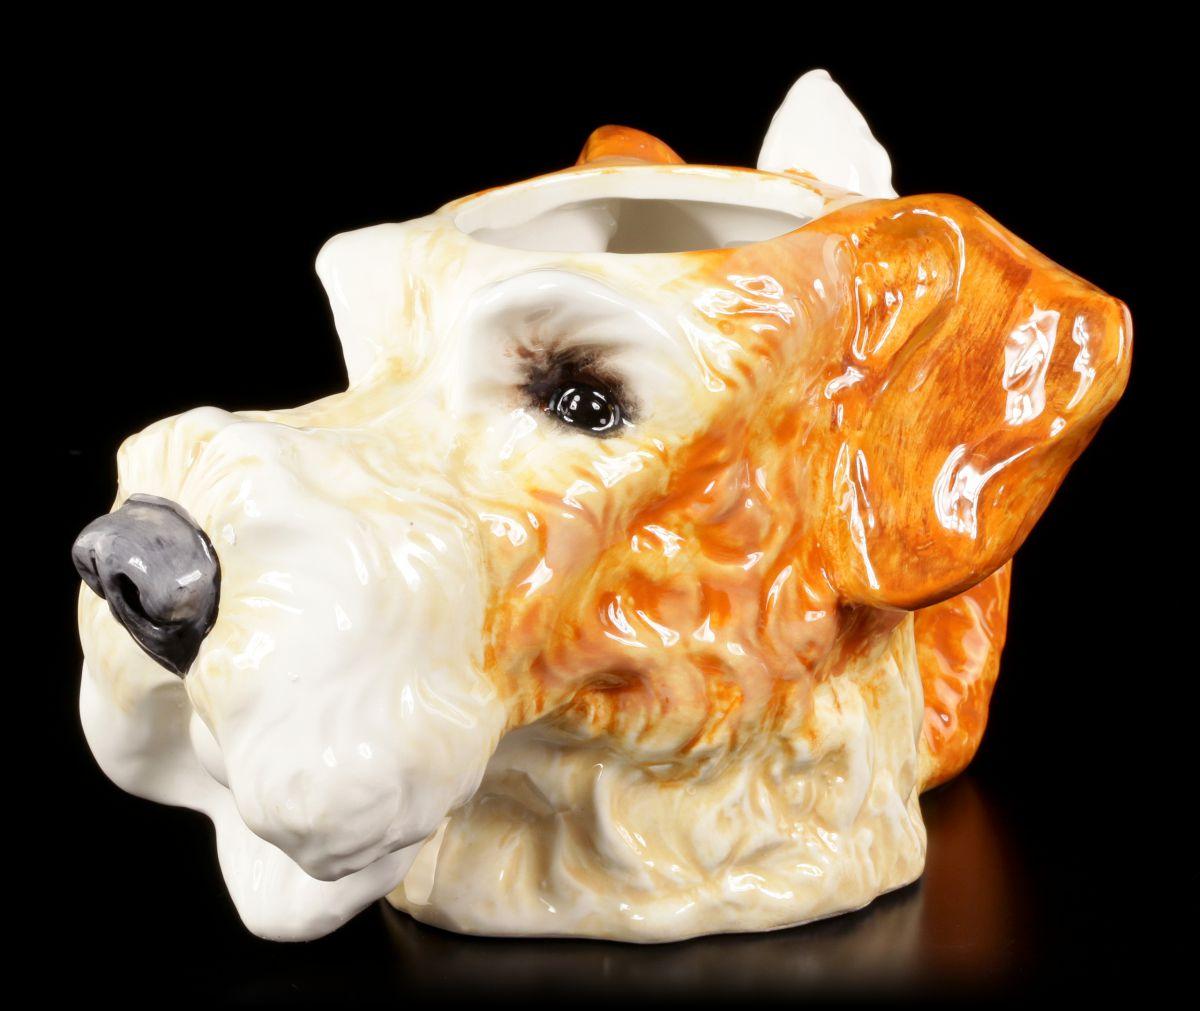 tasse hund keramik drahthaar foxterrier tierkopf spa fun lustig 4260504533138 ebay. Black Bedroom Furniture Sets. Home Design Ideas